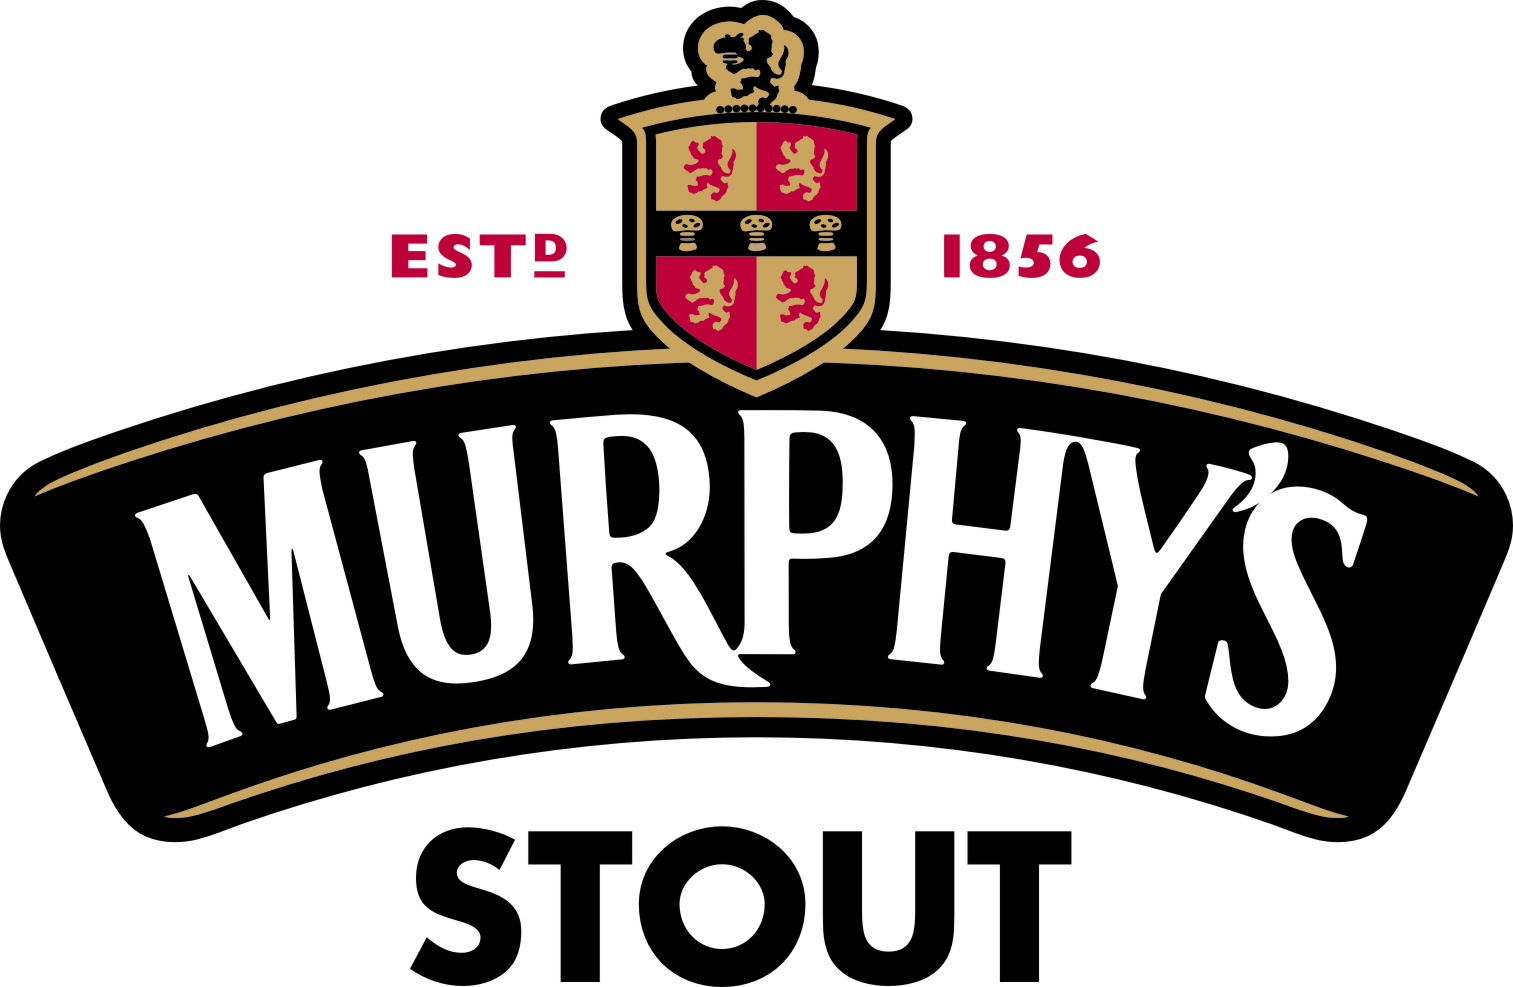 Murphys_Stout